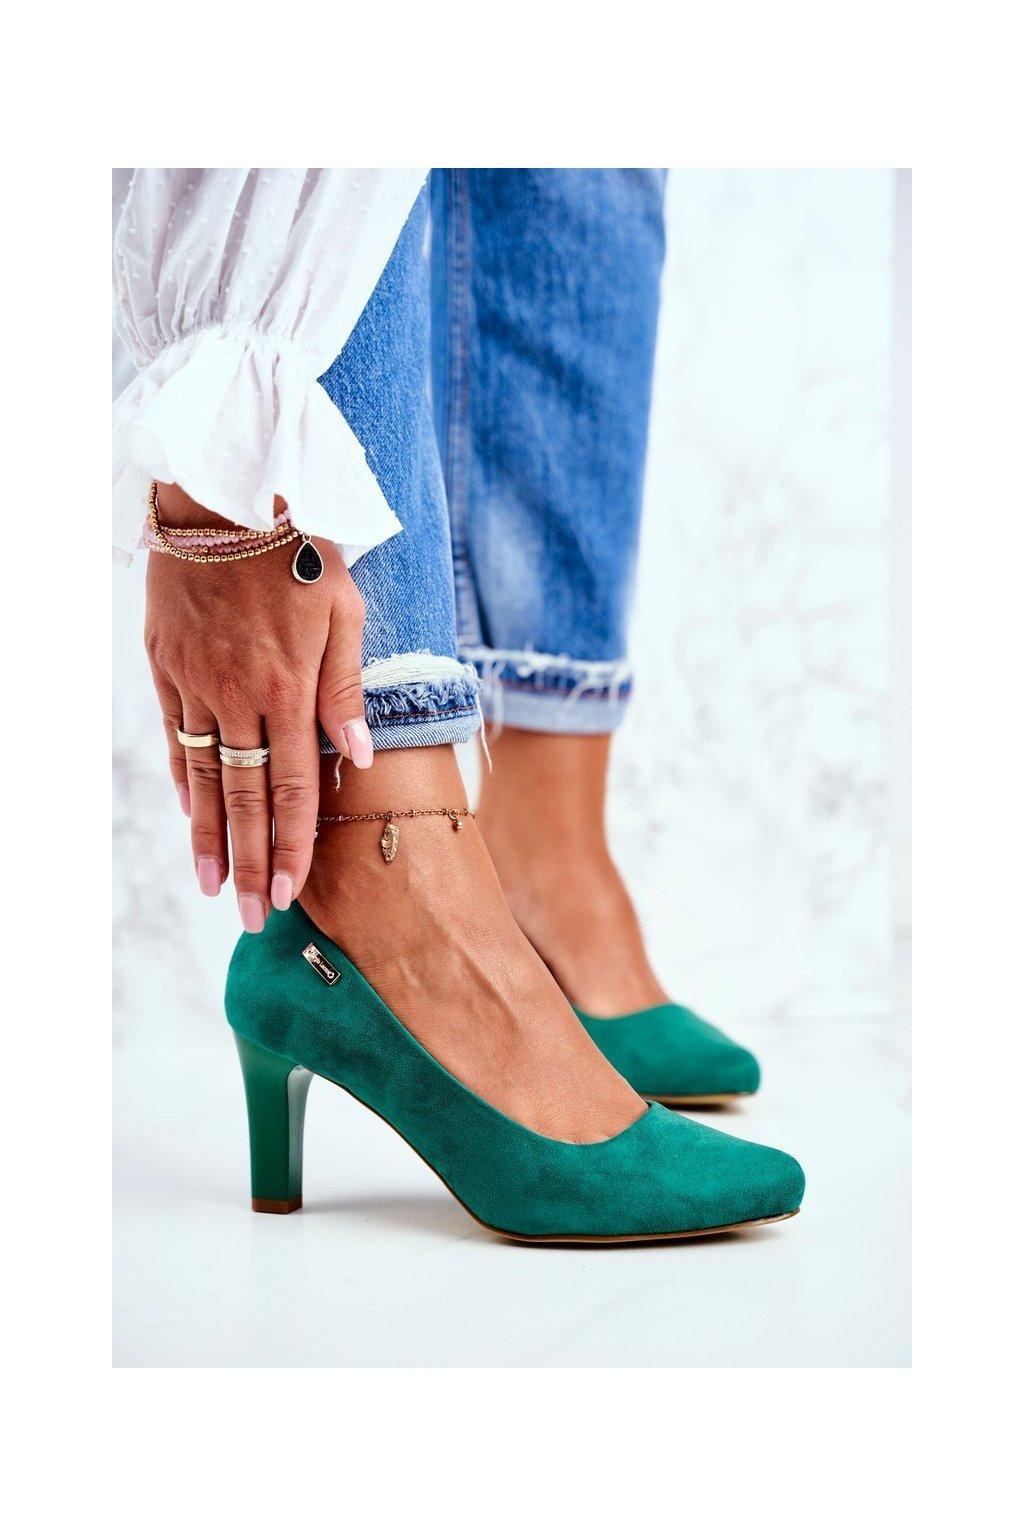 Dámske lodičky farba zelená kód obuvi 1459 J.ZIELONY ZAMSZ